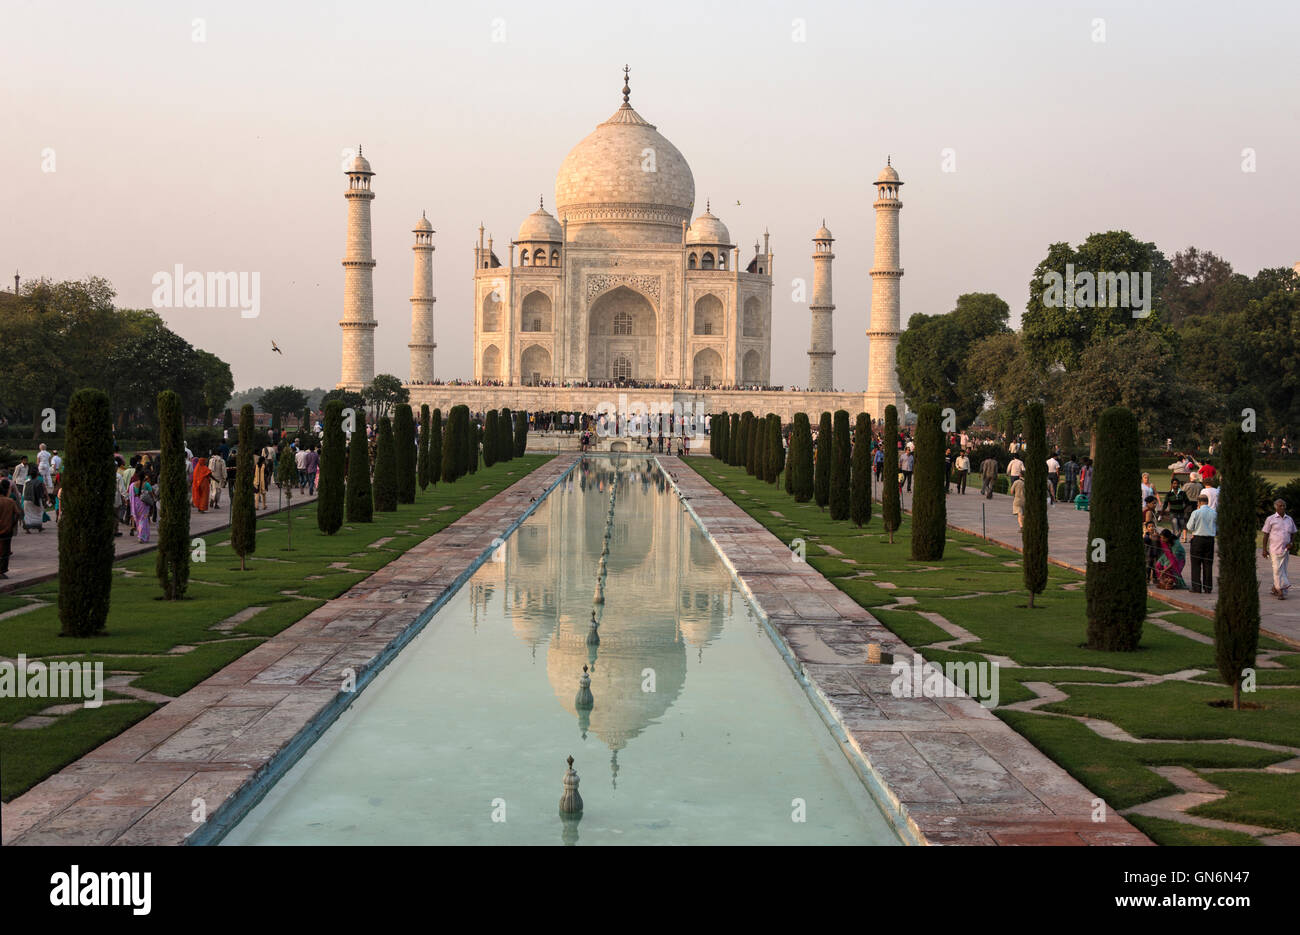 Sun setting over the Taj Mahal and ornamental pool in Agra, Uttar Pradesh, India - Stock Image